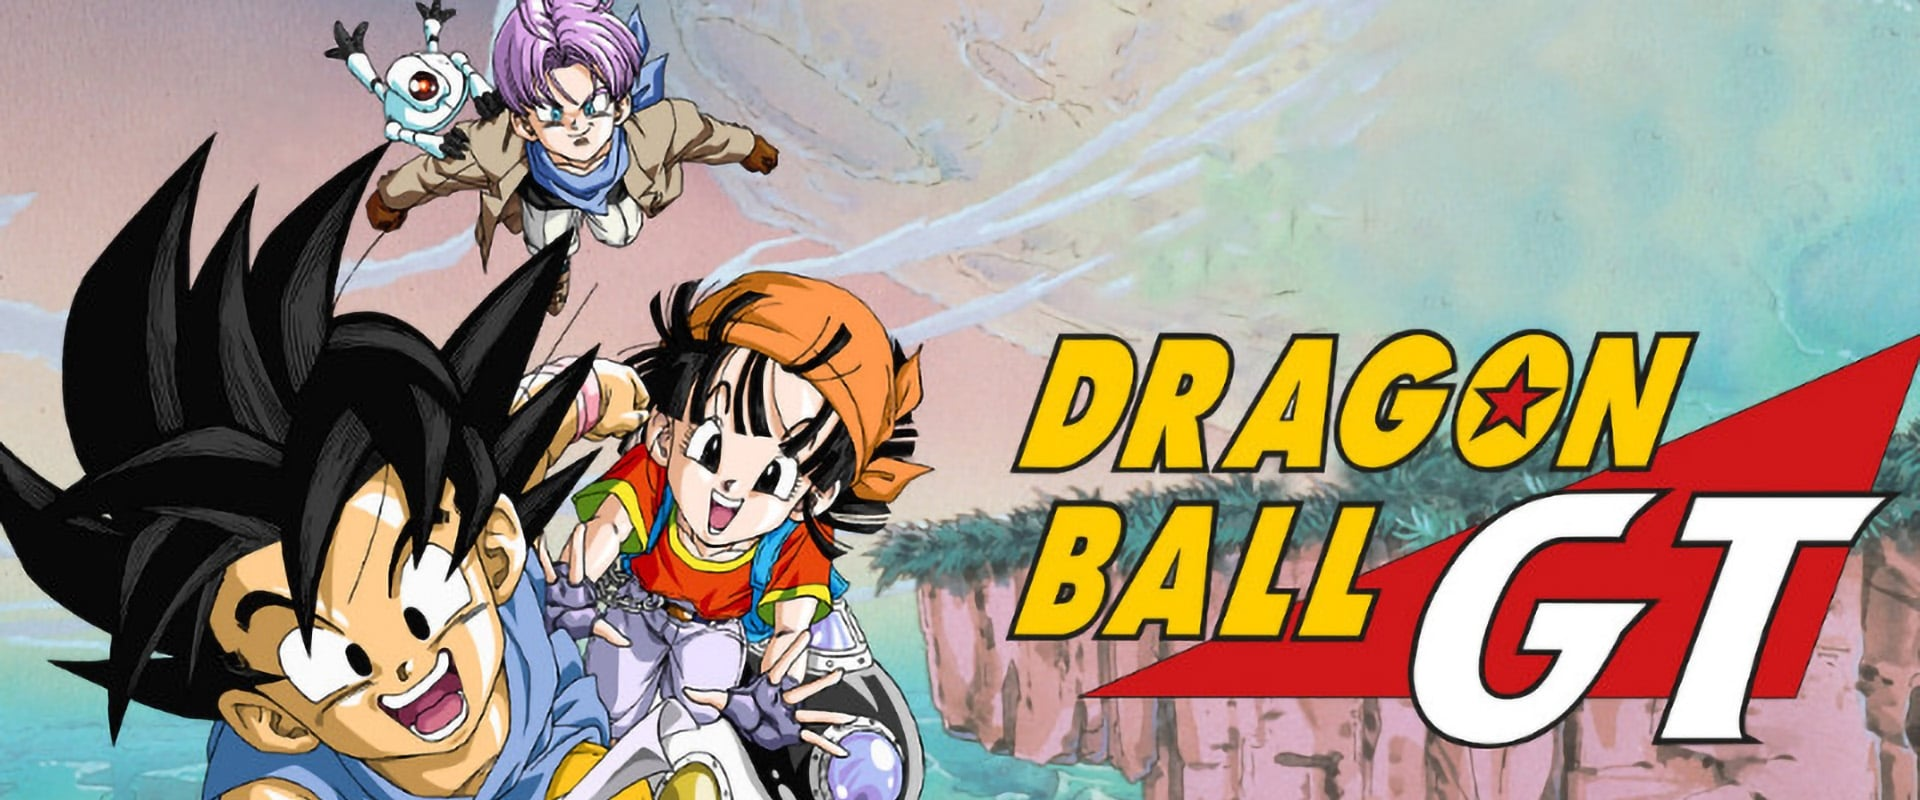 Dragonball GT: The Movie - Son-Goku Jr.